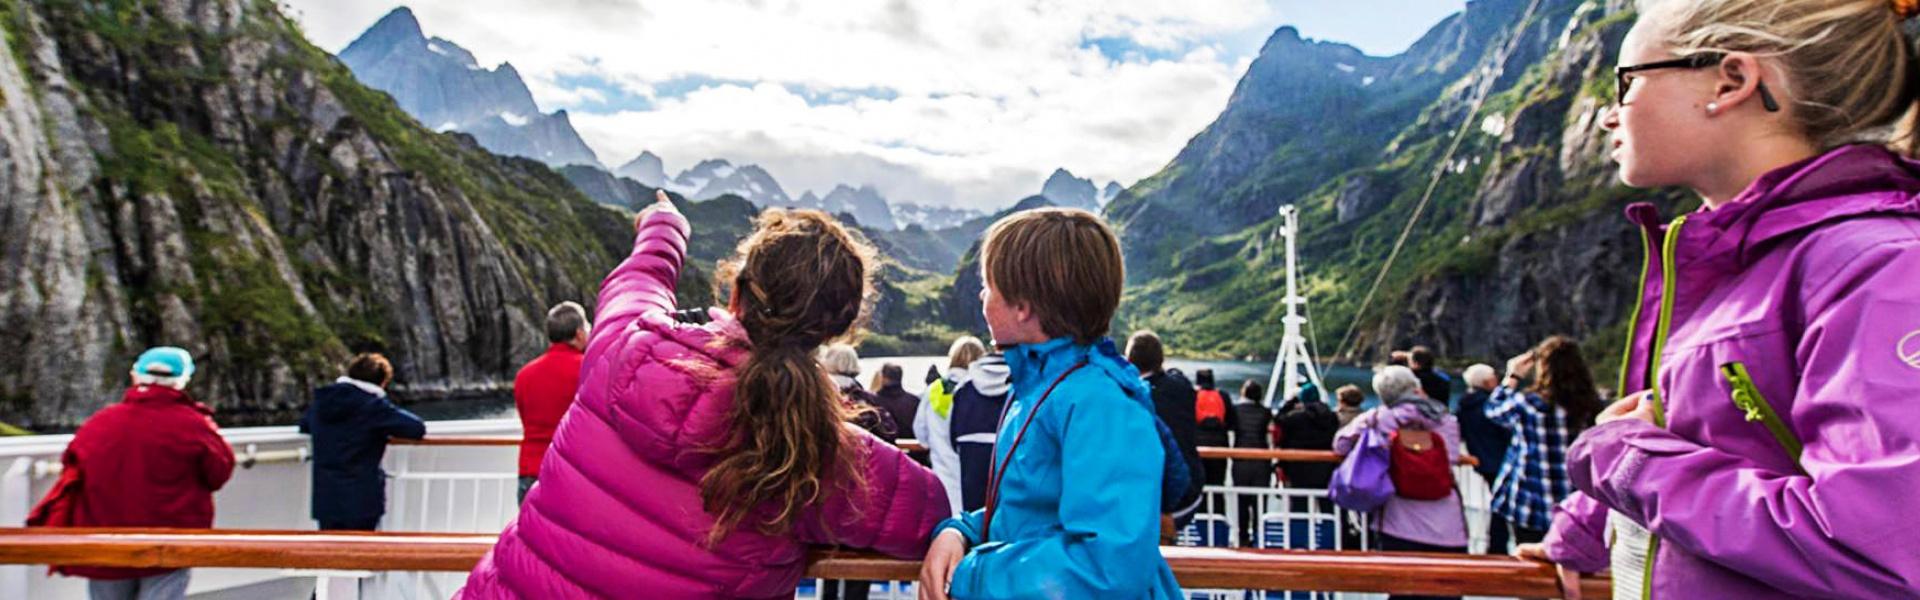 Cruising the Norwegian fjords on board the Hurtigruten ship